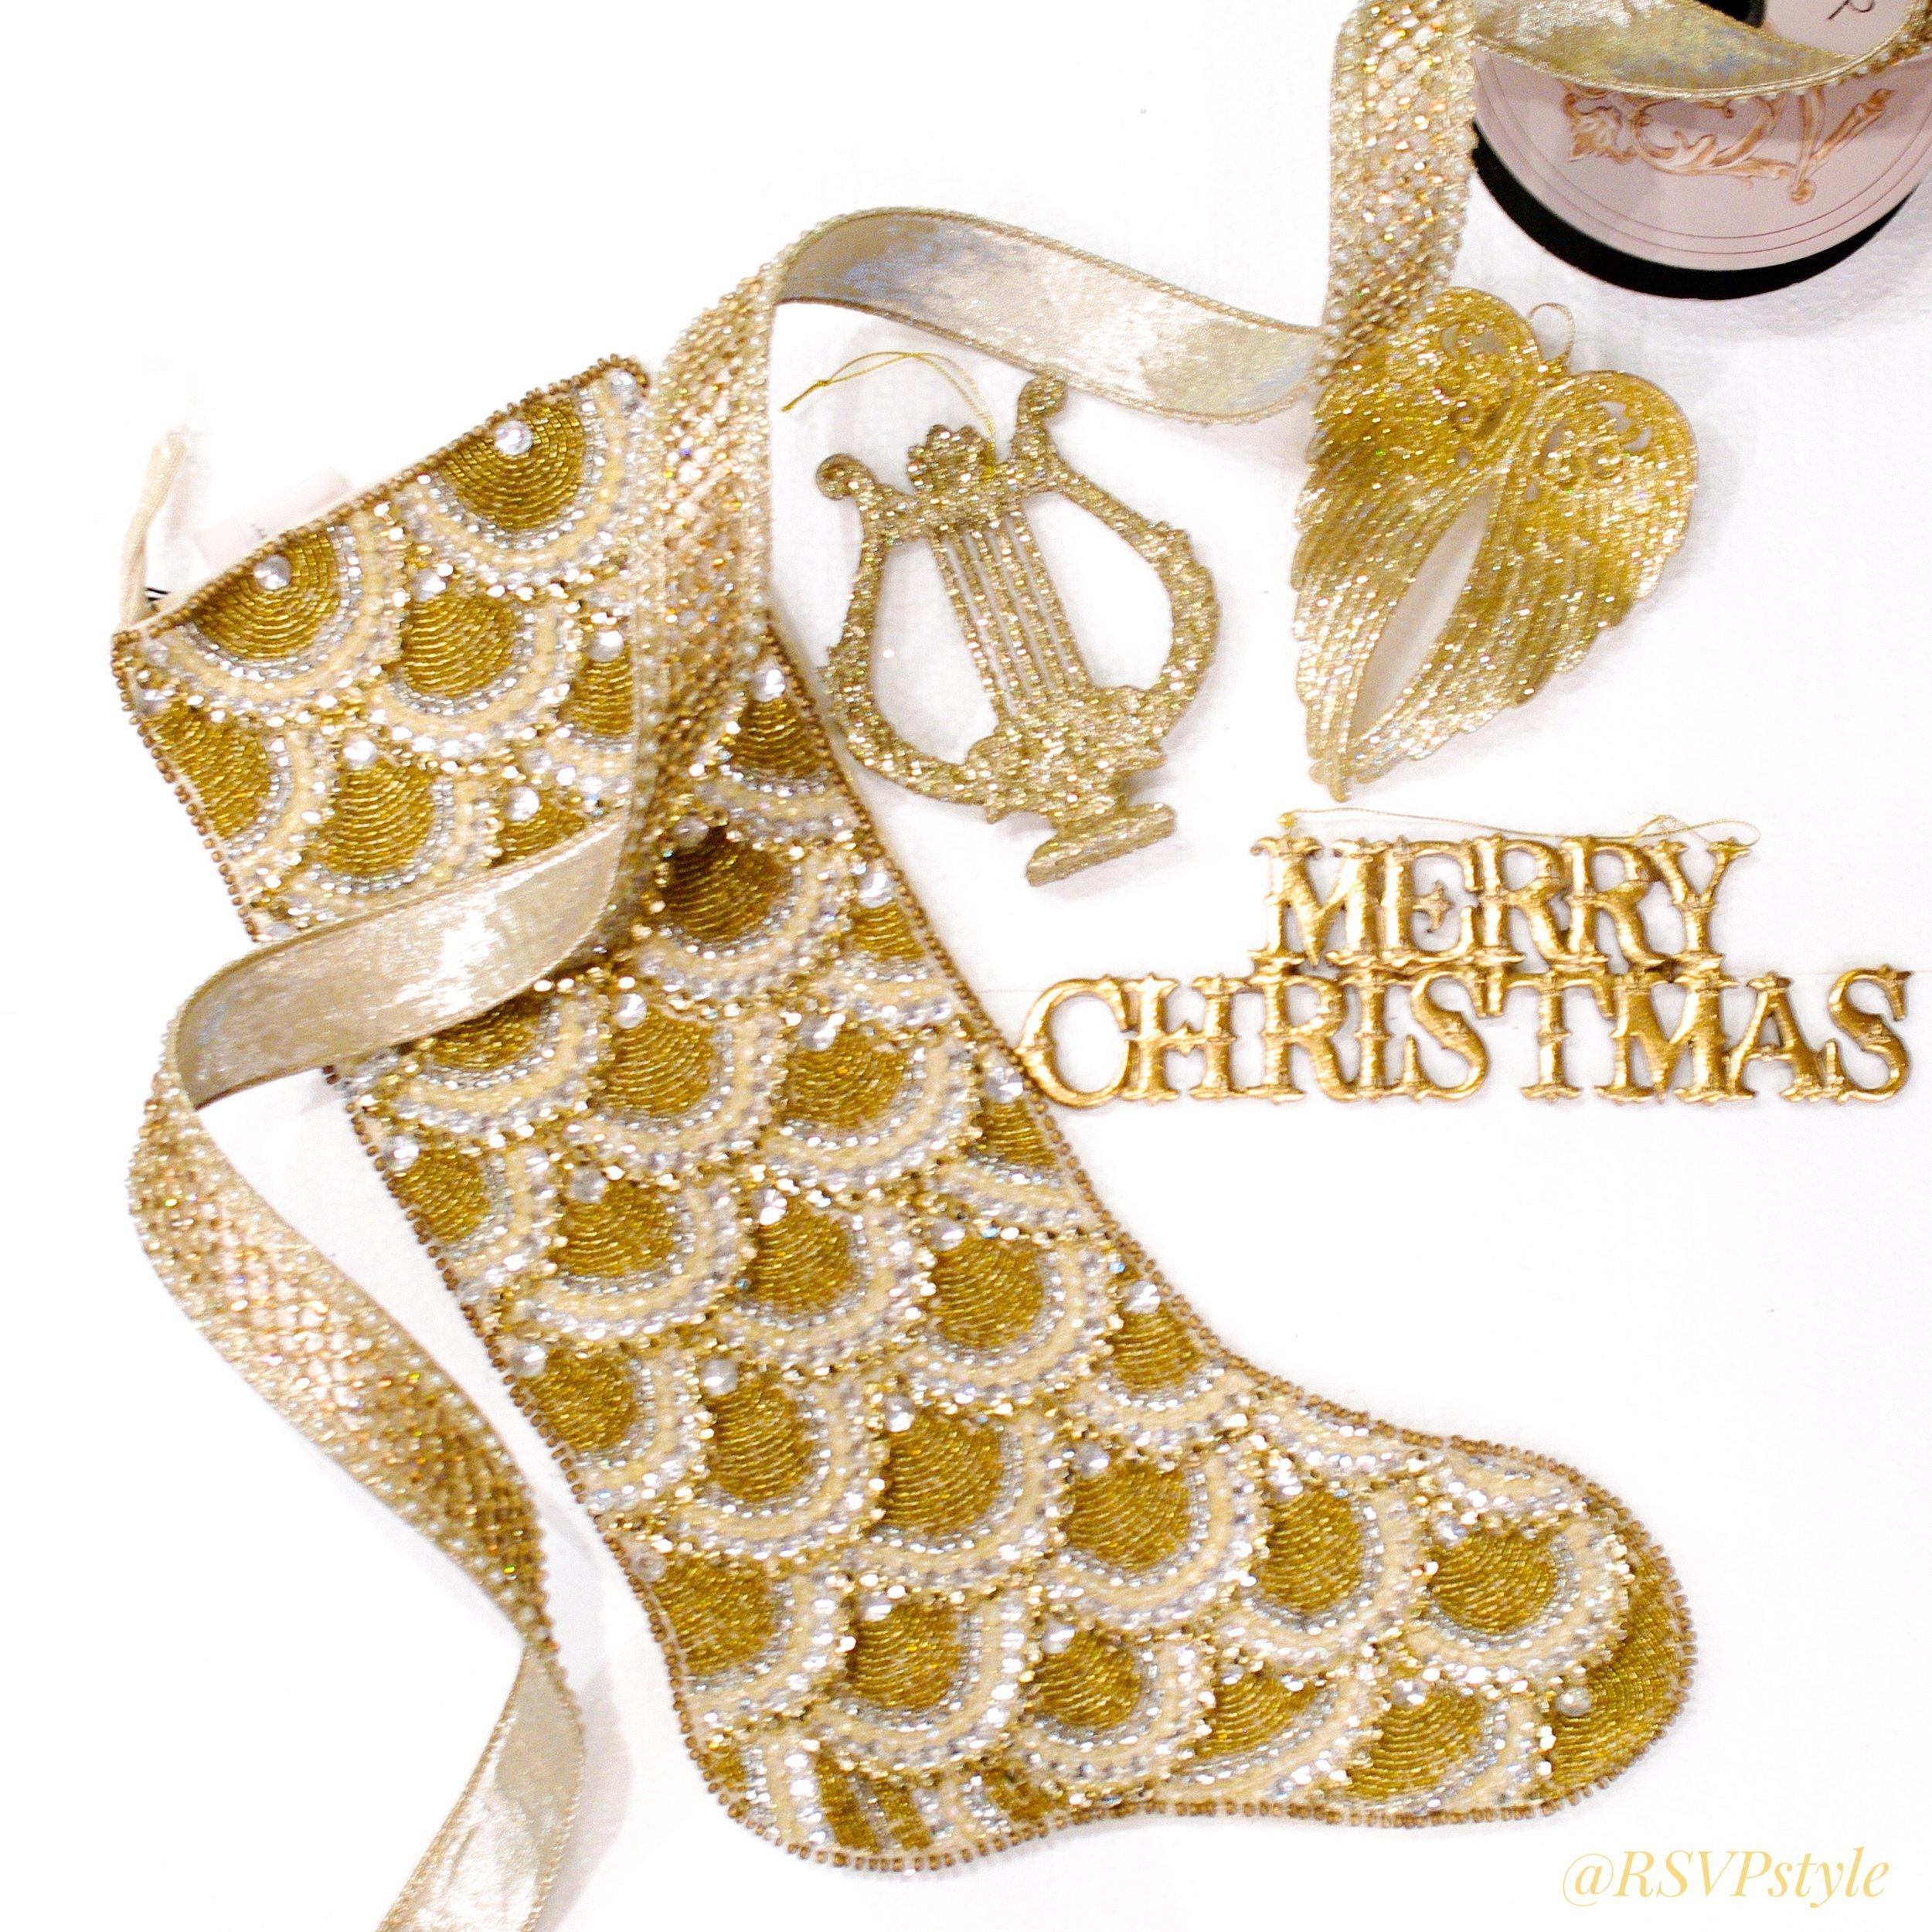 Christmas Stockings & Decor